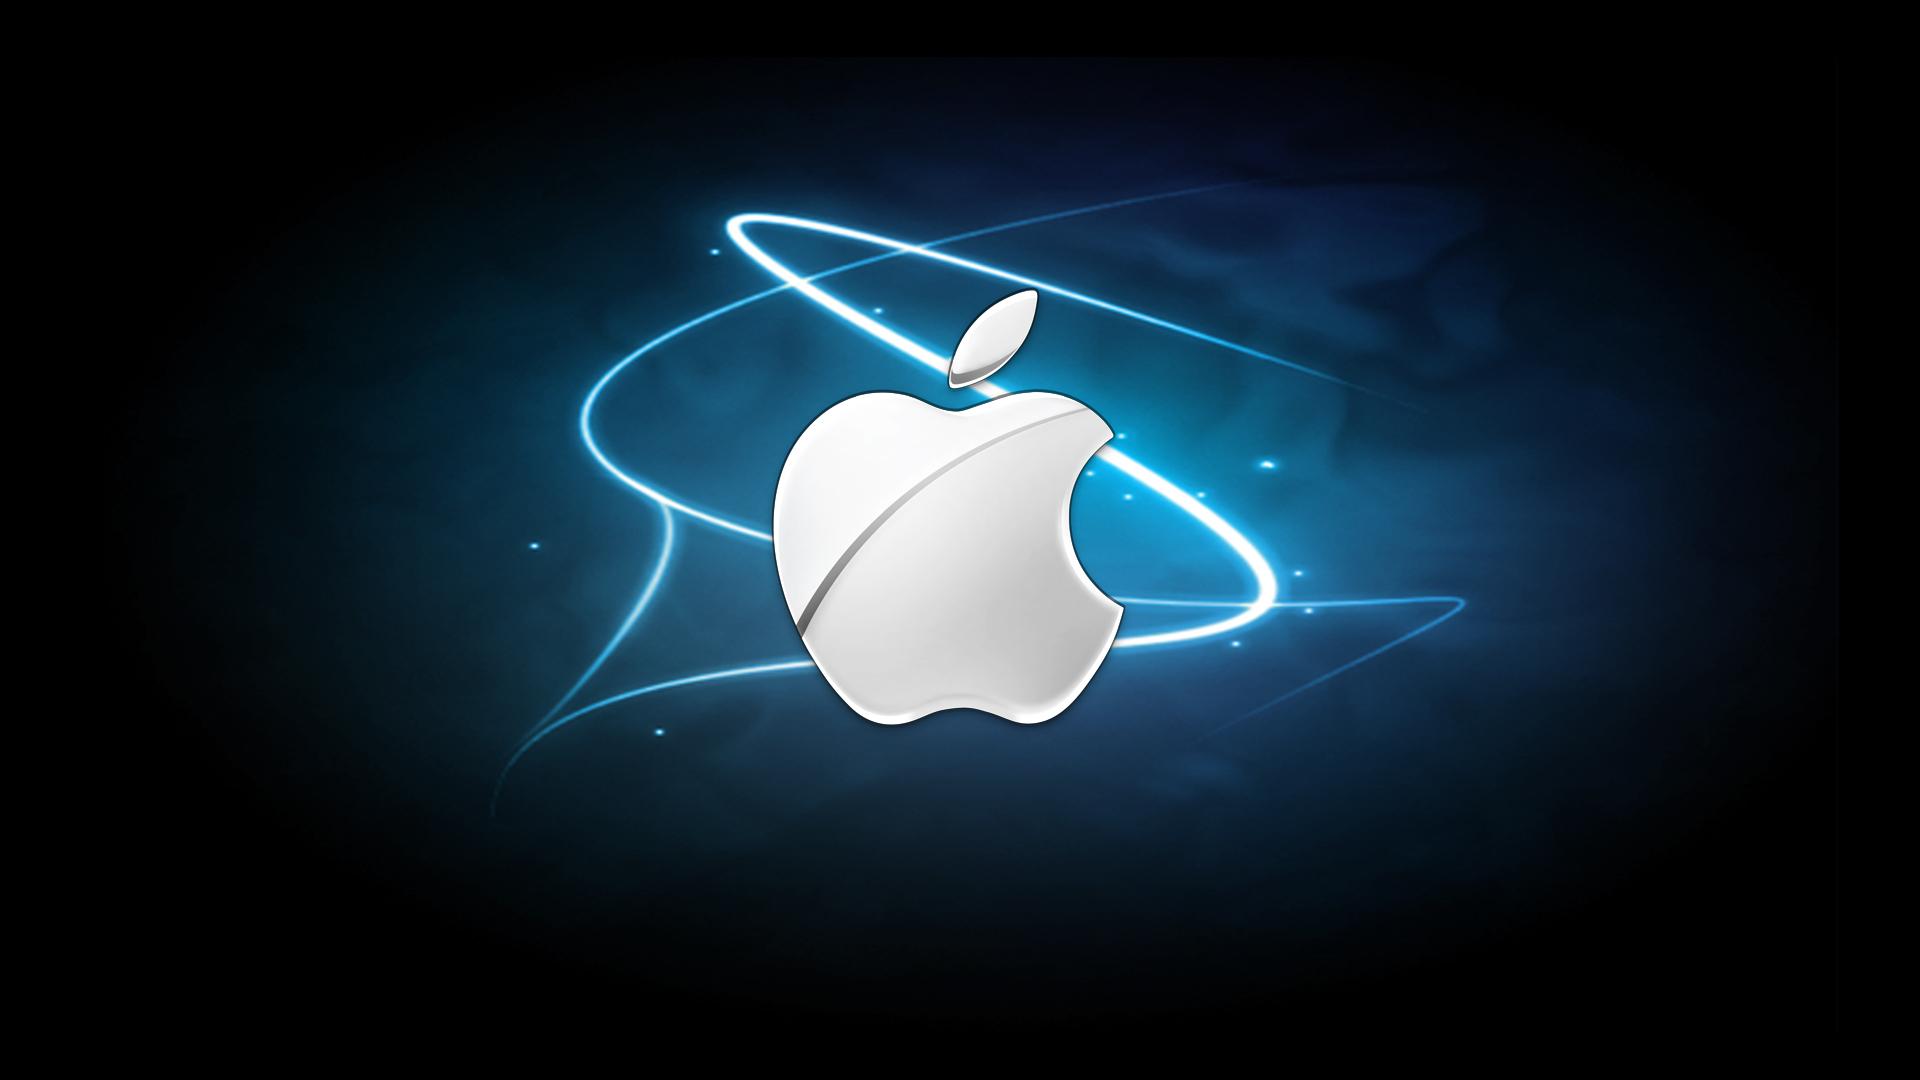 apple logo wallpaper applelogowallpaper apple logo wallpaper